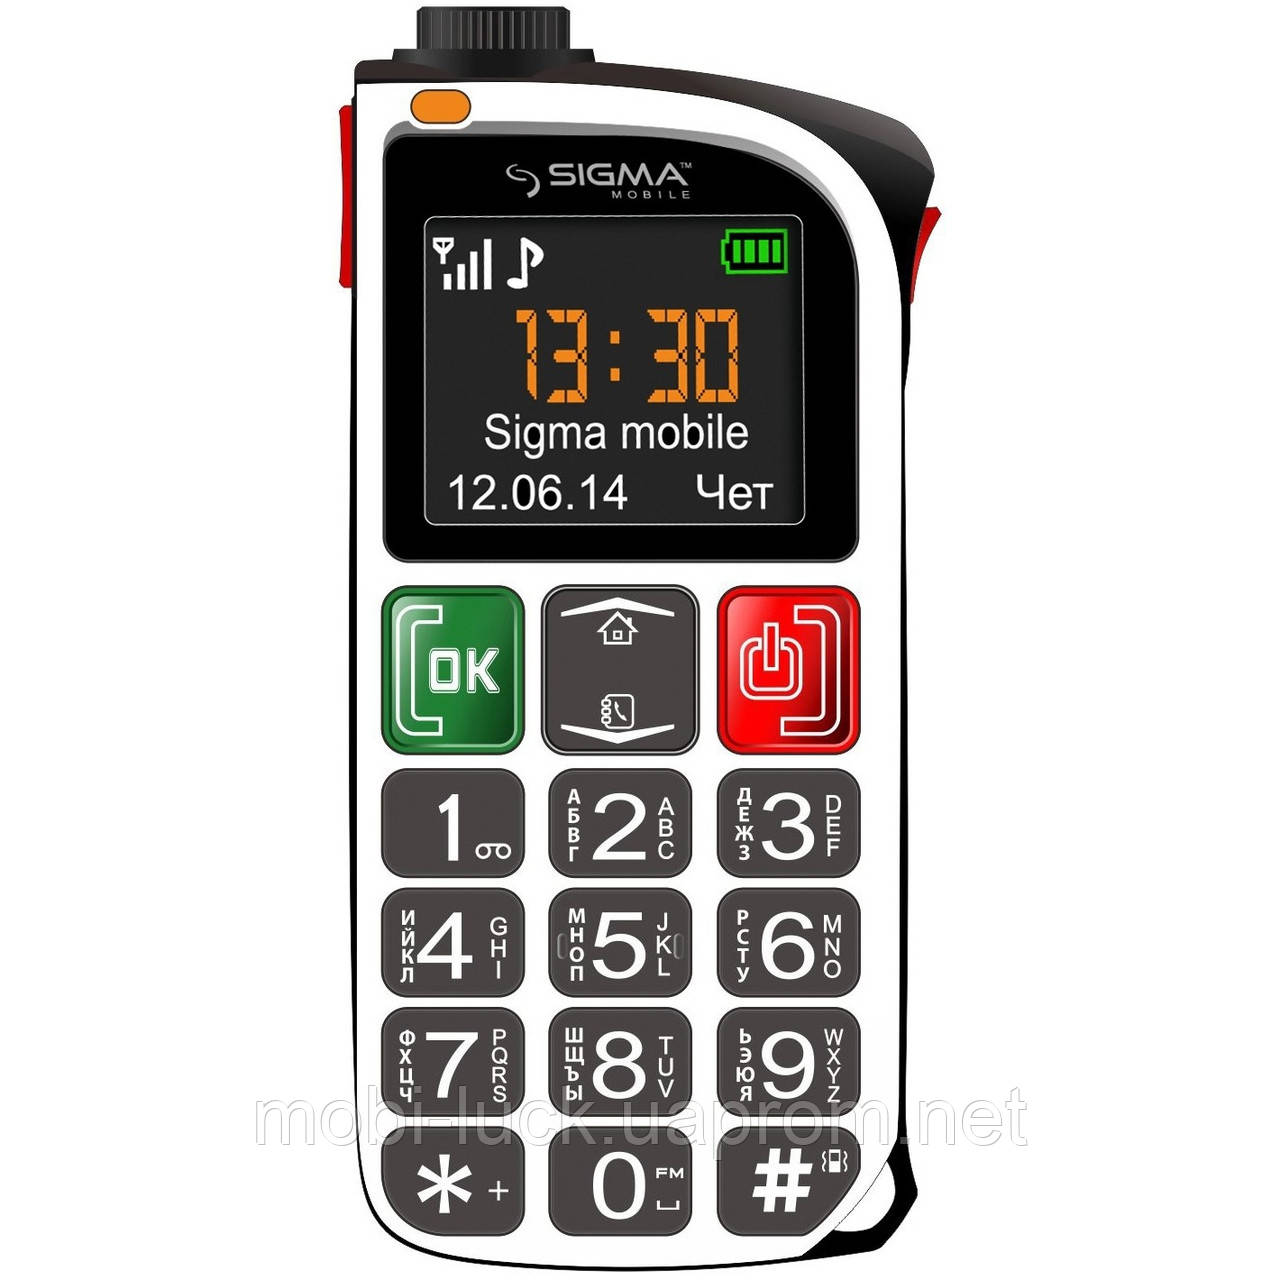 Телефон Sigma Comfort 50 Light 1,8 дюйма, 2 сим, 1100 мА/ч.